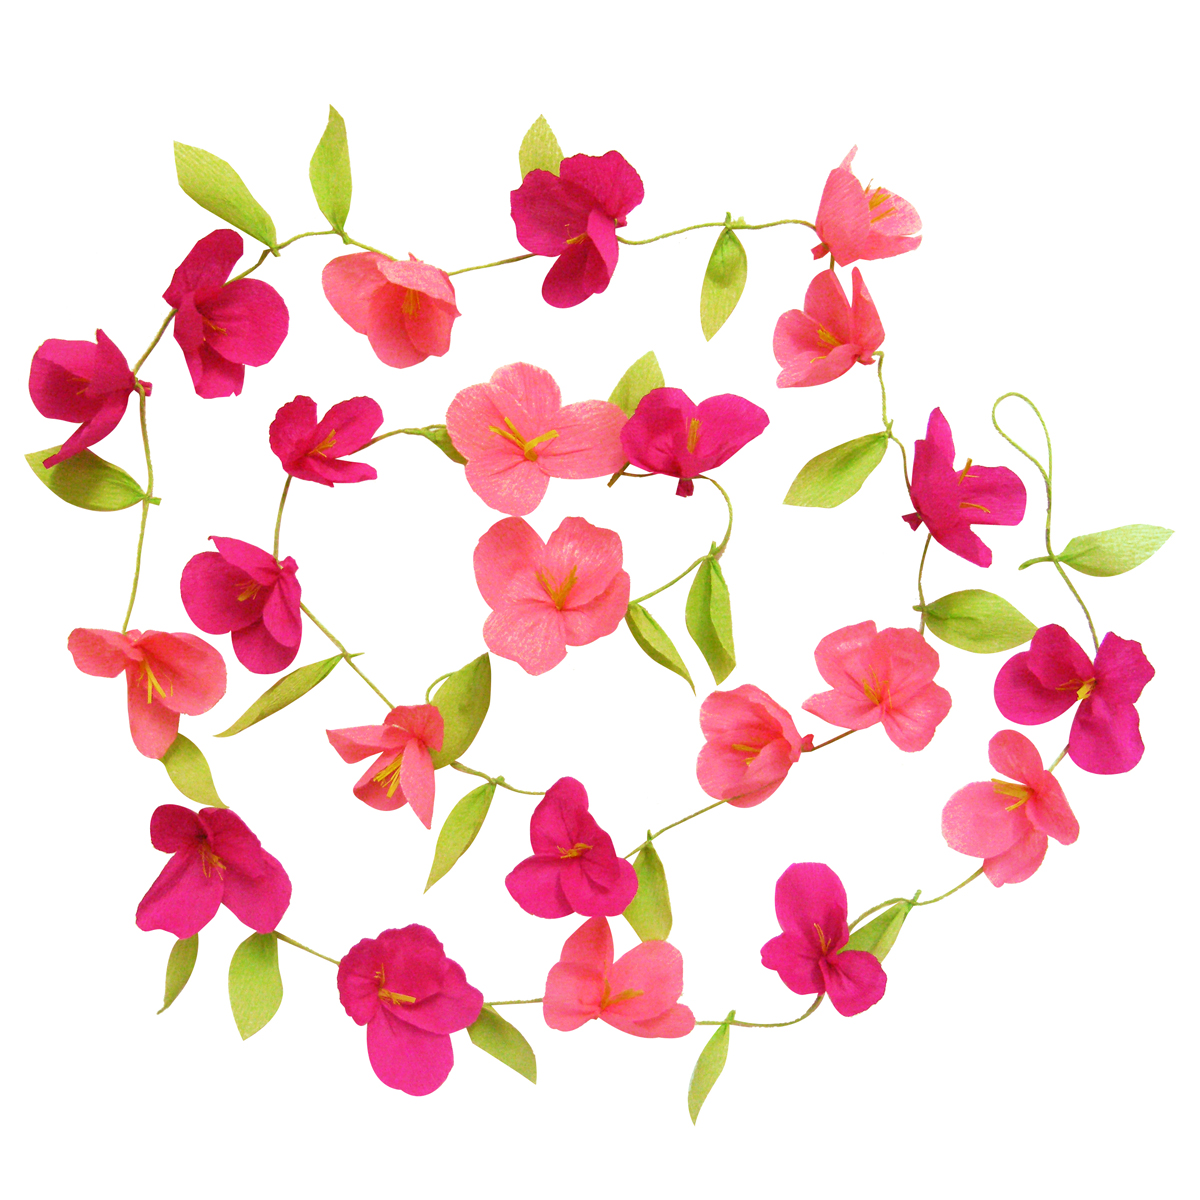 dessins en couleurs imprimer fleurs num ro 616285. Black Bedroom Furniture Sets. Home Design Ideas